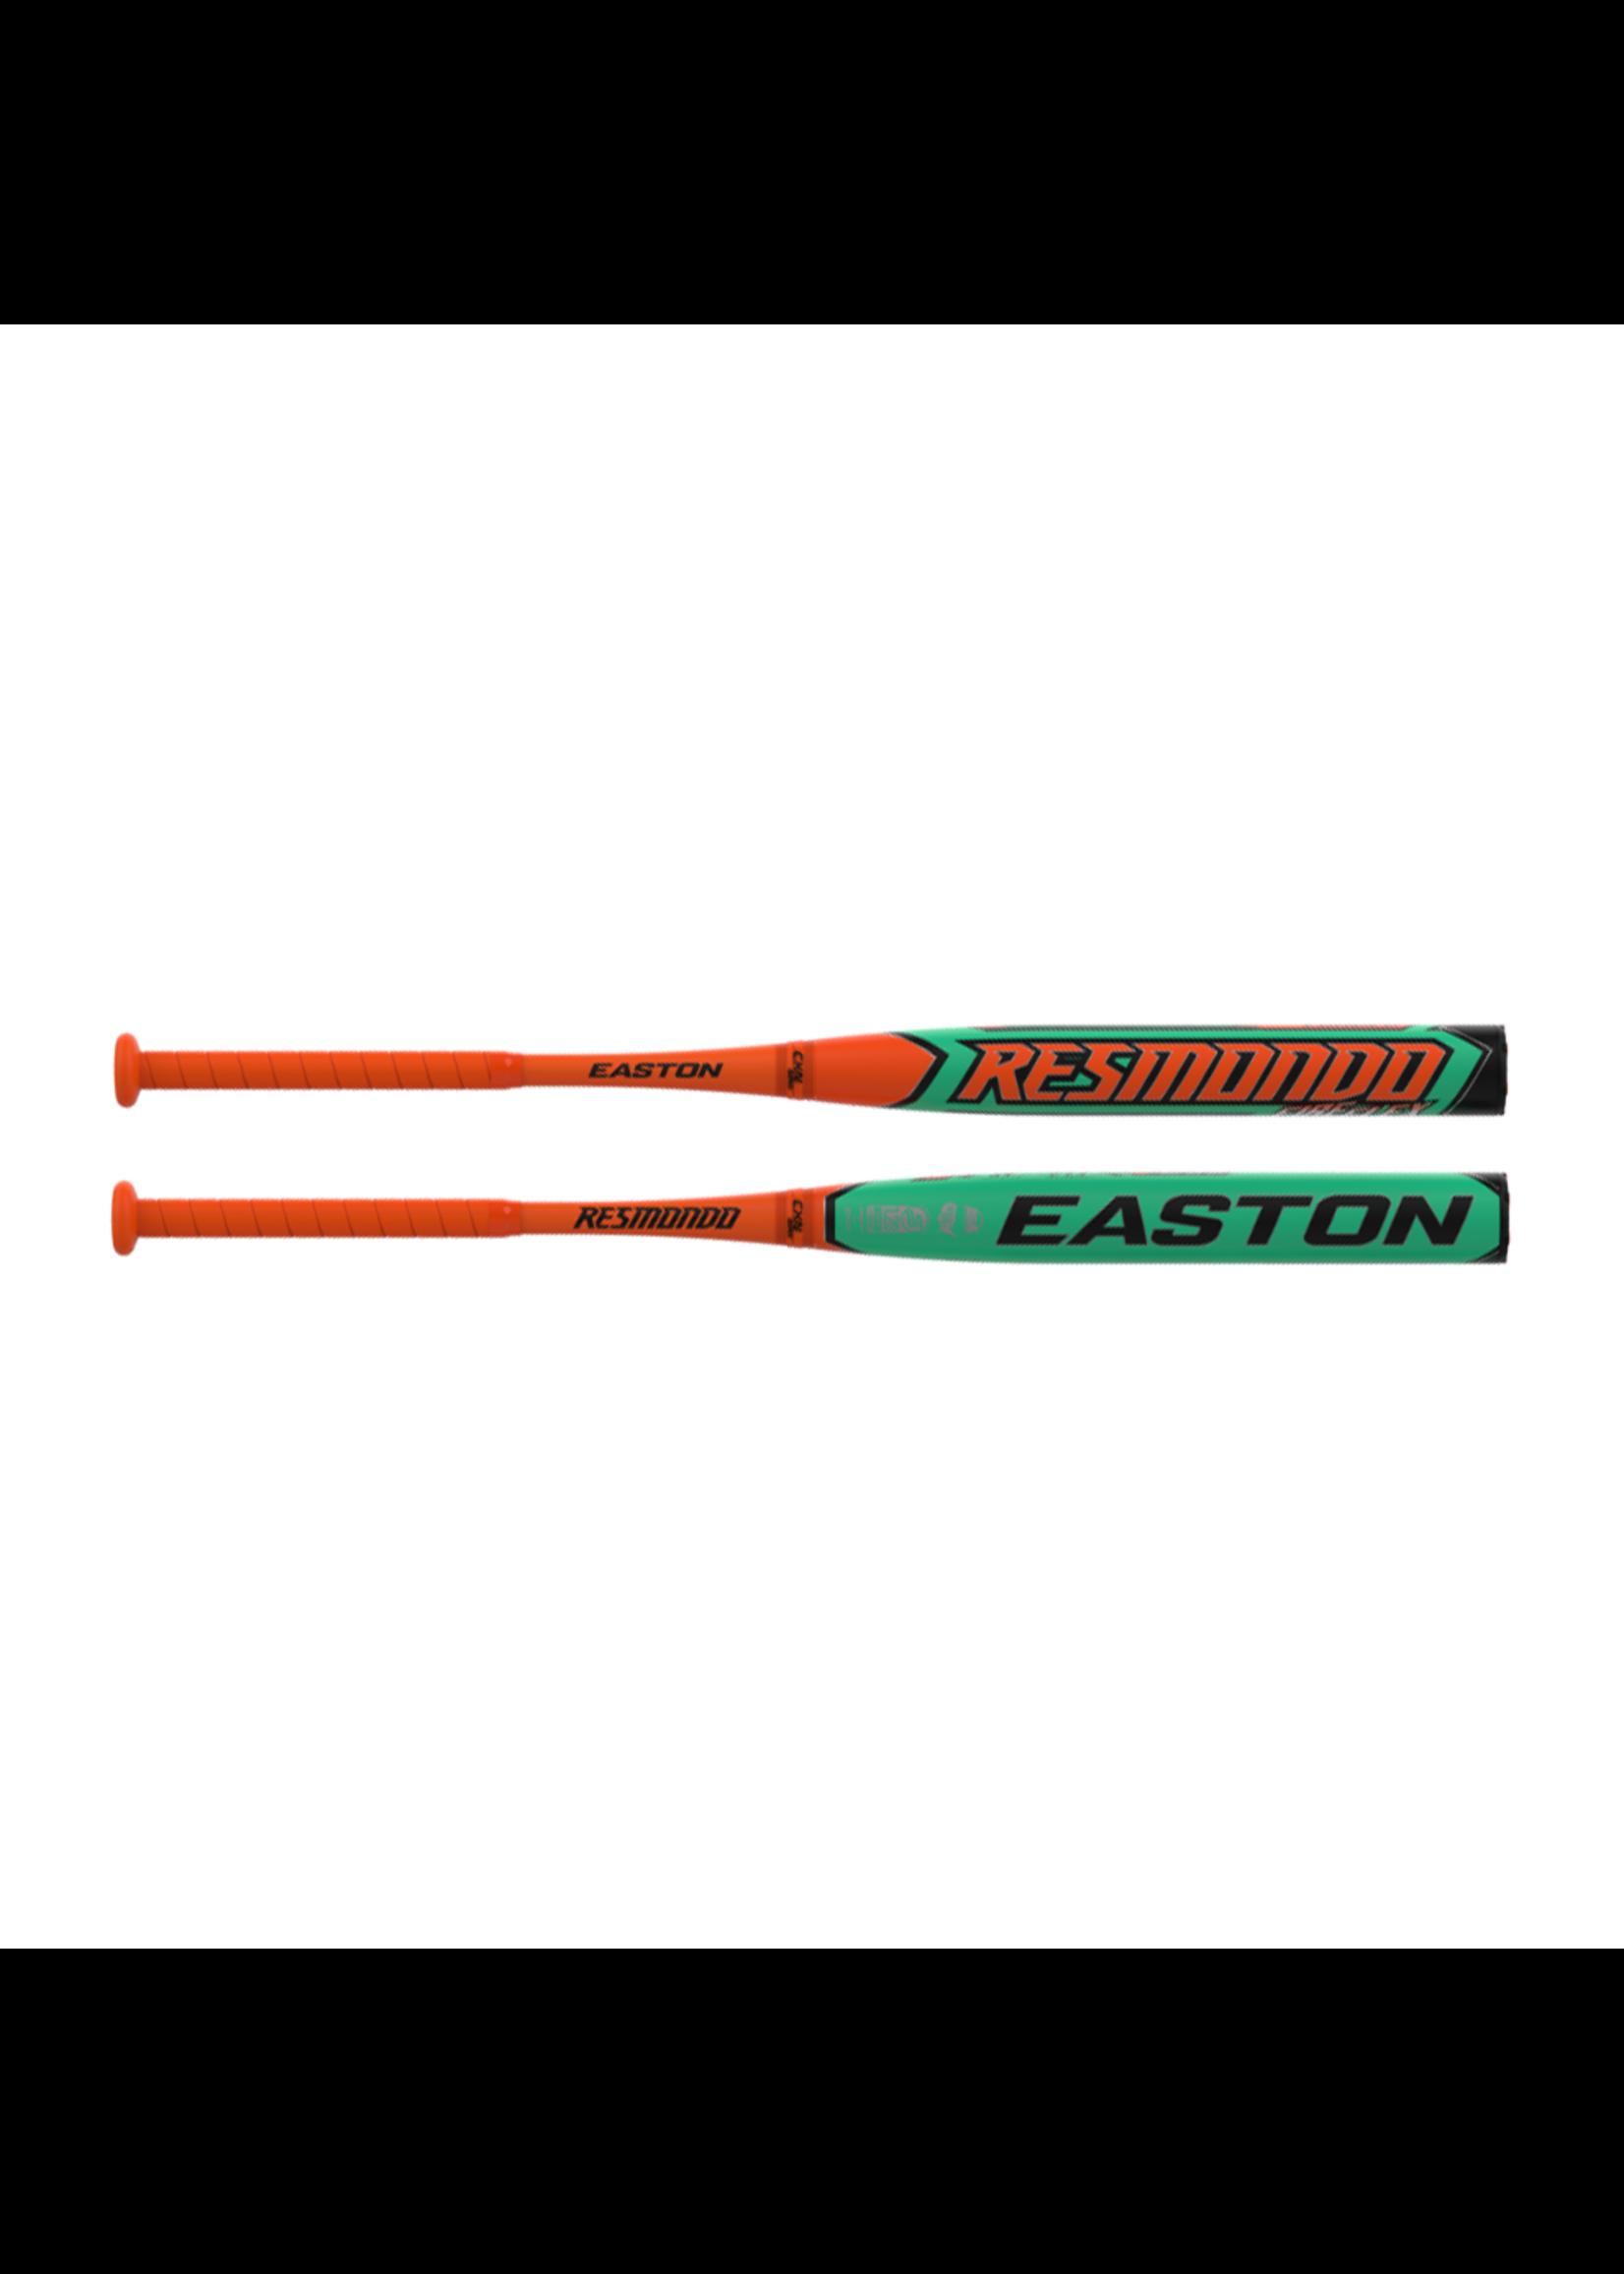 Easton Baseball (Canada) EASTON FIRE FLEX RESMONDO ENDLOAD 12.75 USSSA BÂTON SLOWPITCH